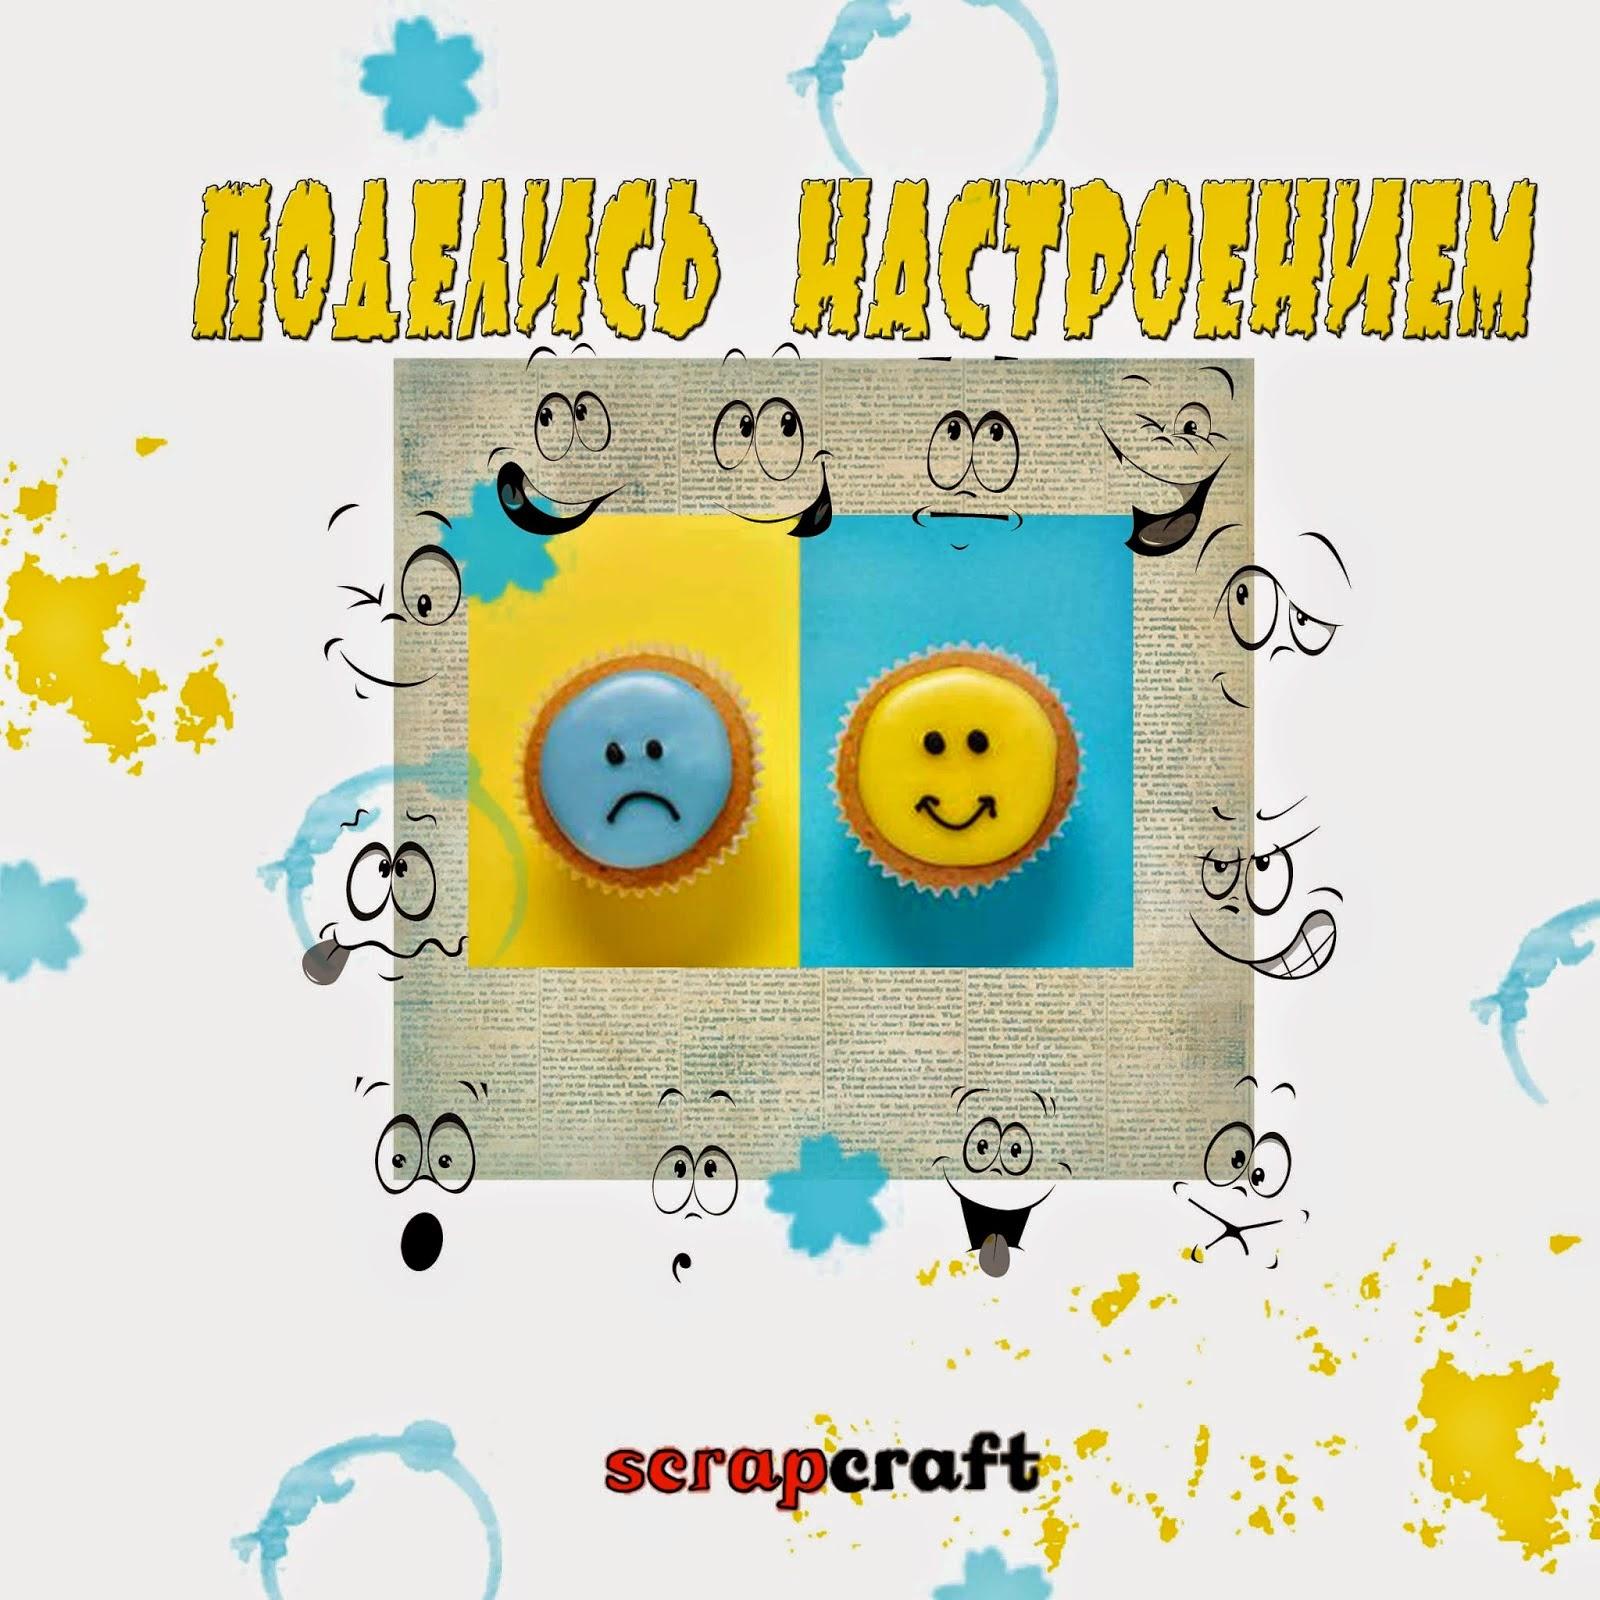 http://scrapcraft-ru.blogspot.com/2014/07/29.html